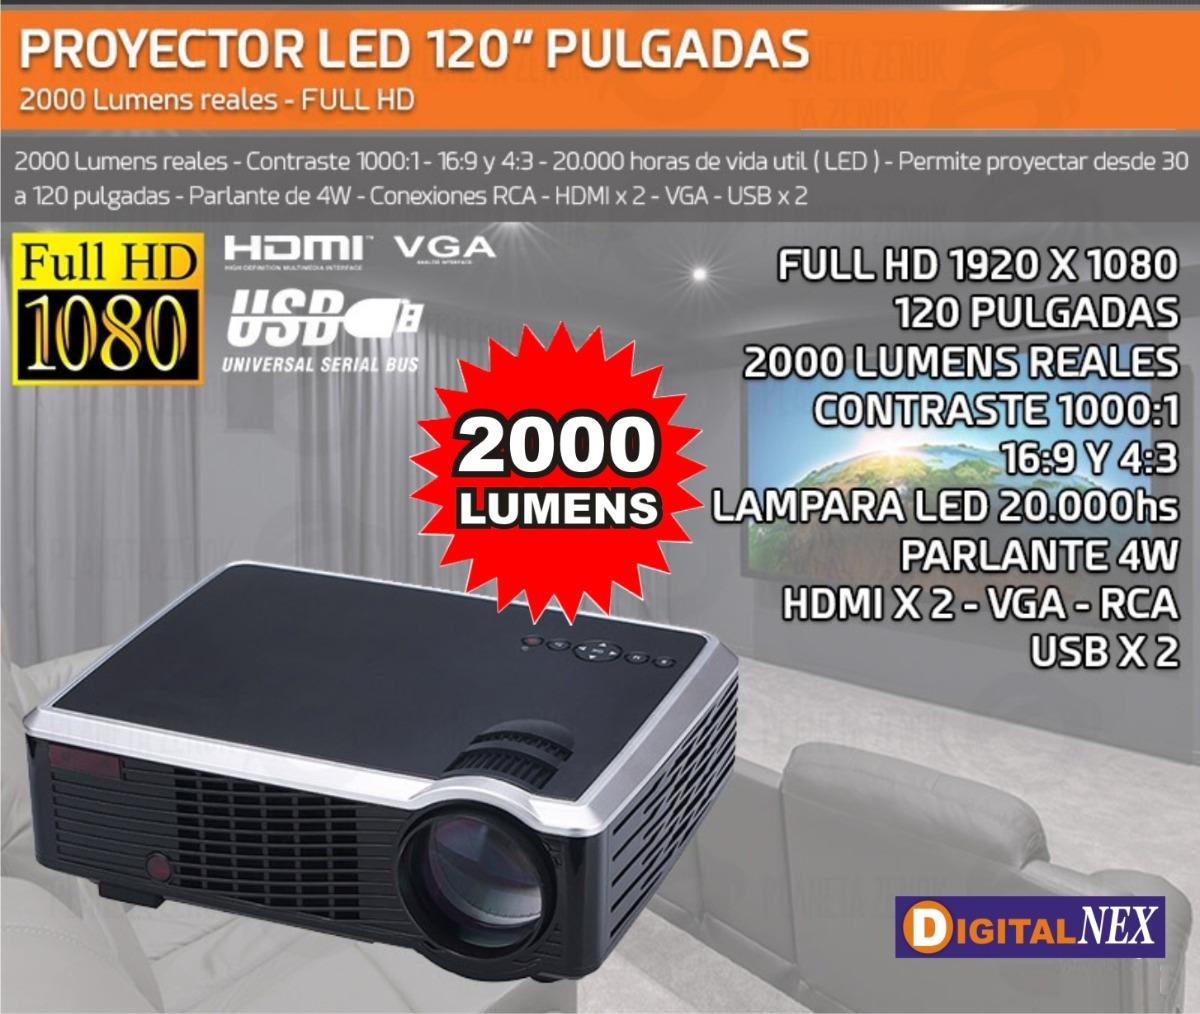 https://http2.mlstatic.com/proyector-led-2000-lumens-reales-hdmi-usb-tv-1080p-6-cuotas-D_NQ_NP_788176-MLA29933329364_042019-F.jpg